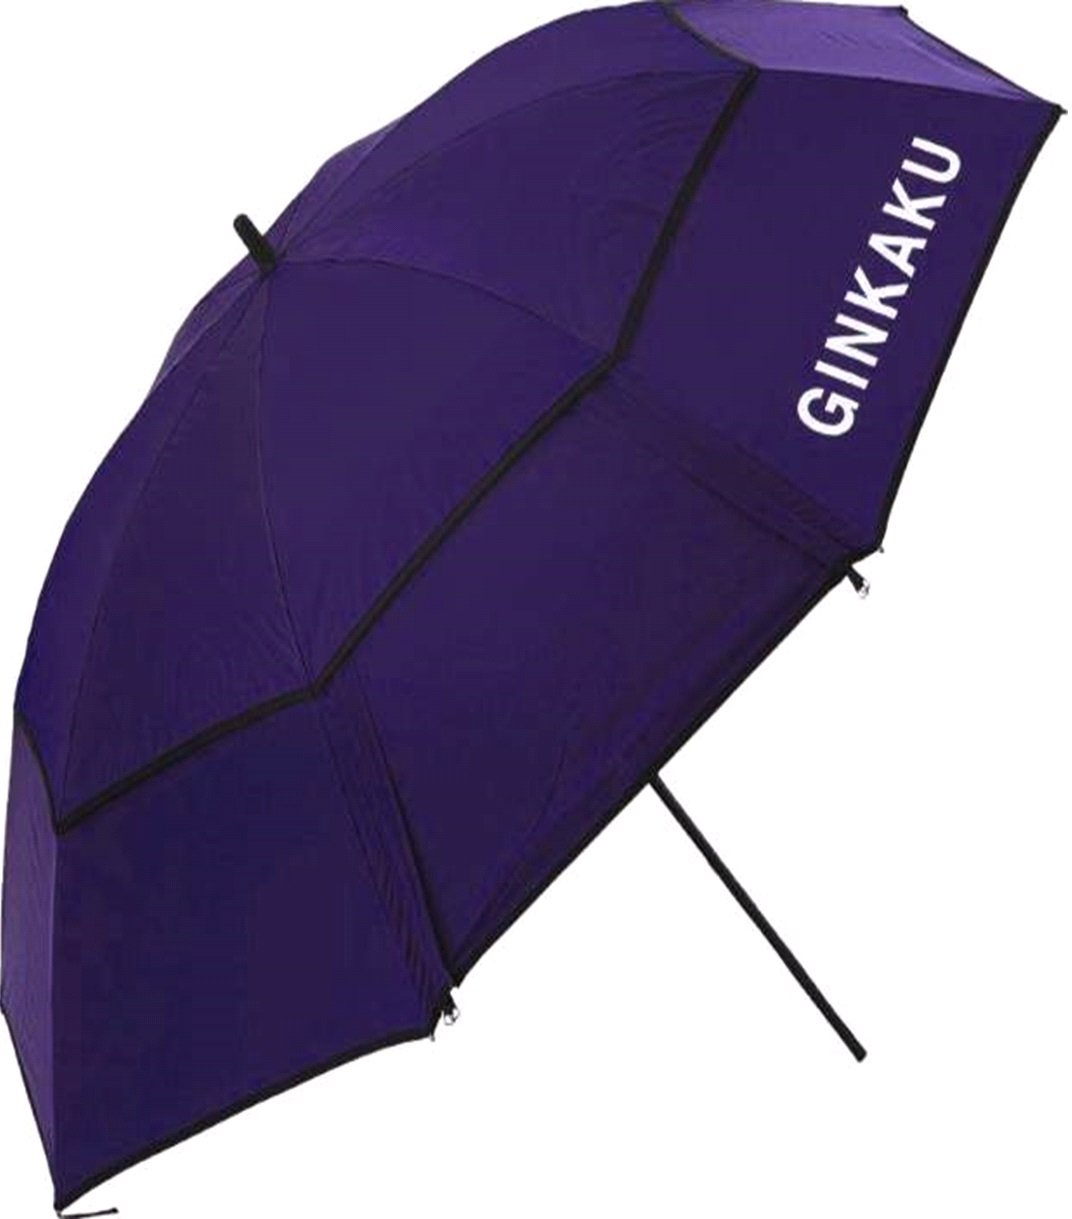 GLOBERIDE(グローブライド) GINKAKUヘラパラソル(W) G-215 パープル B0777F6SGH